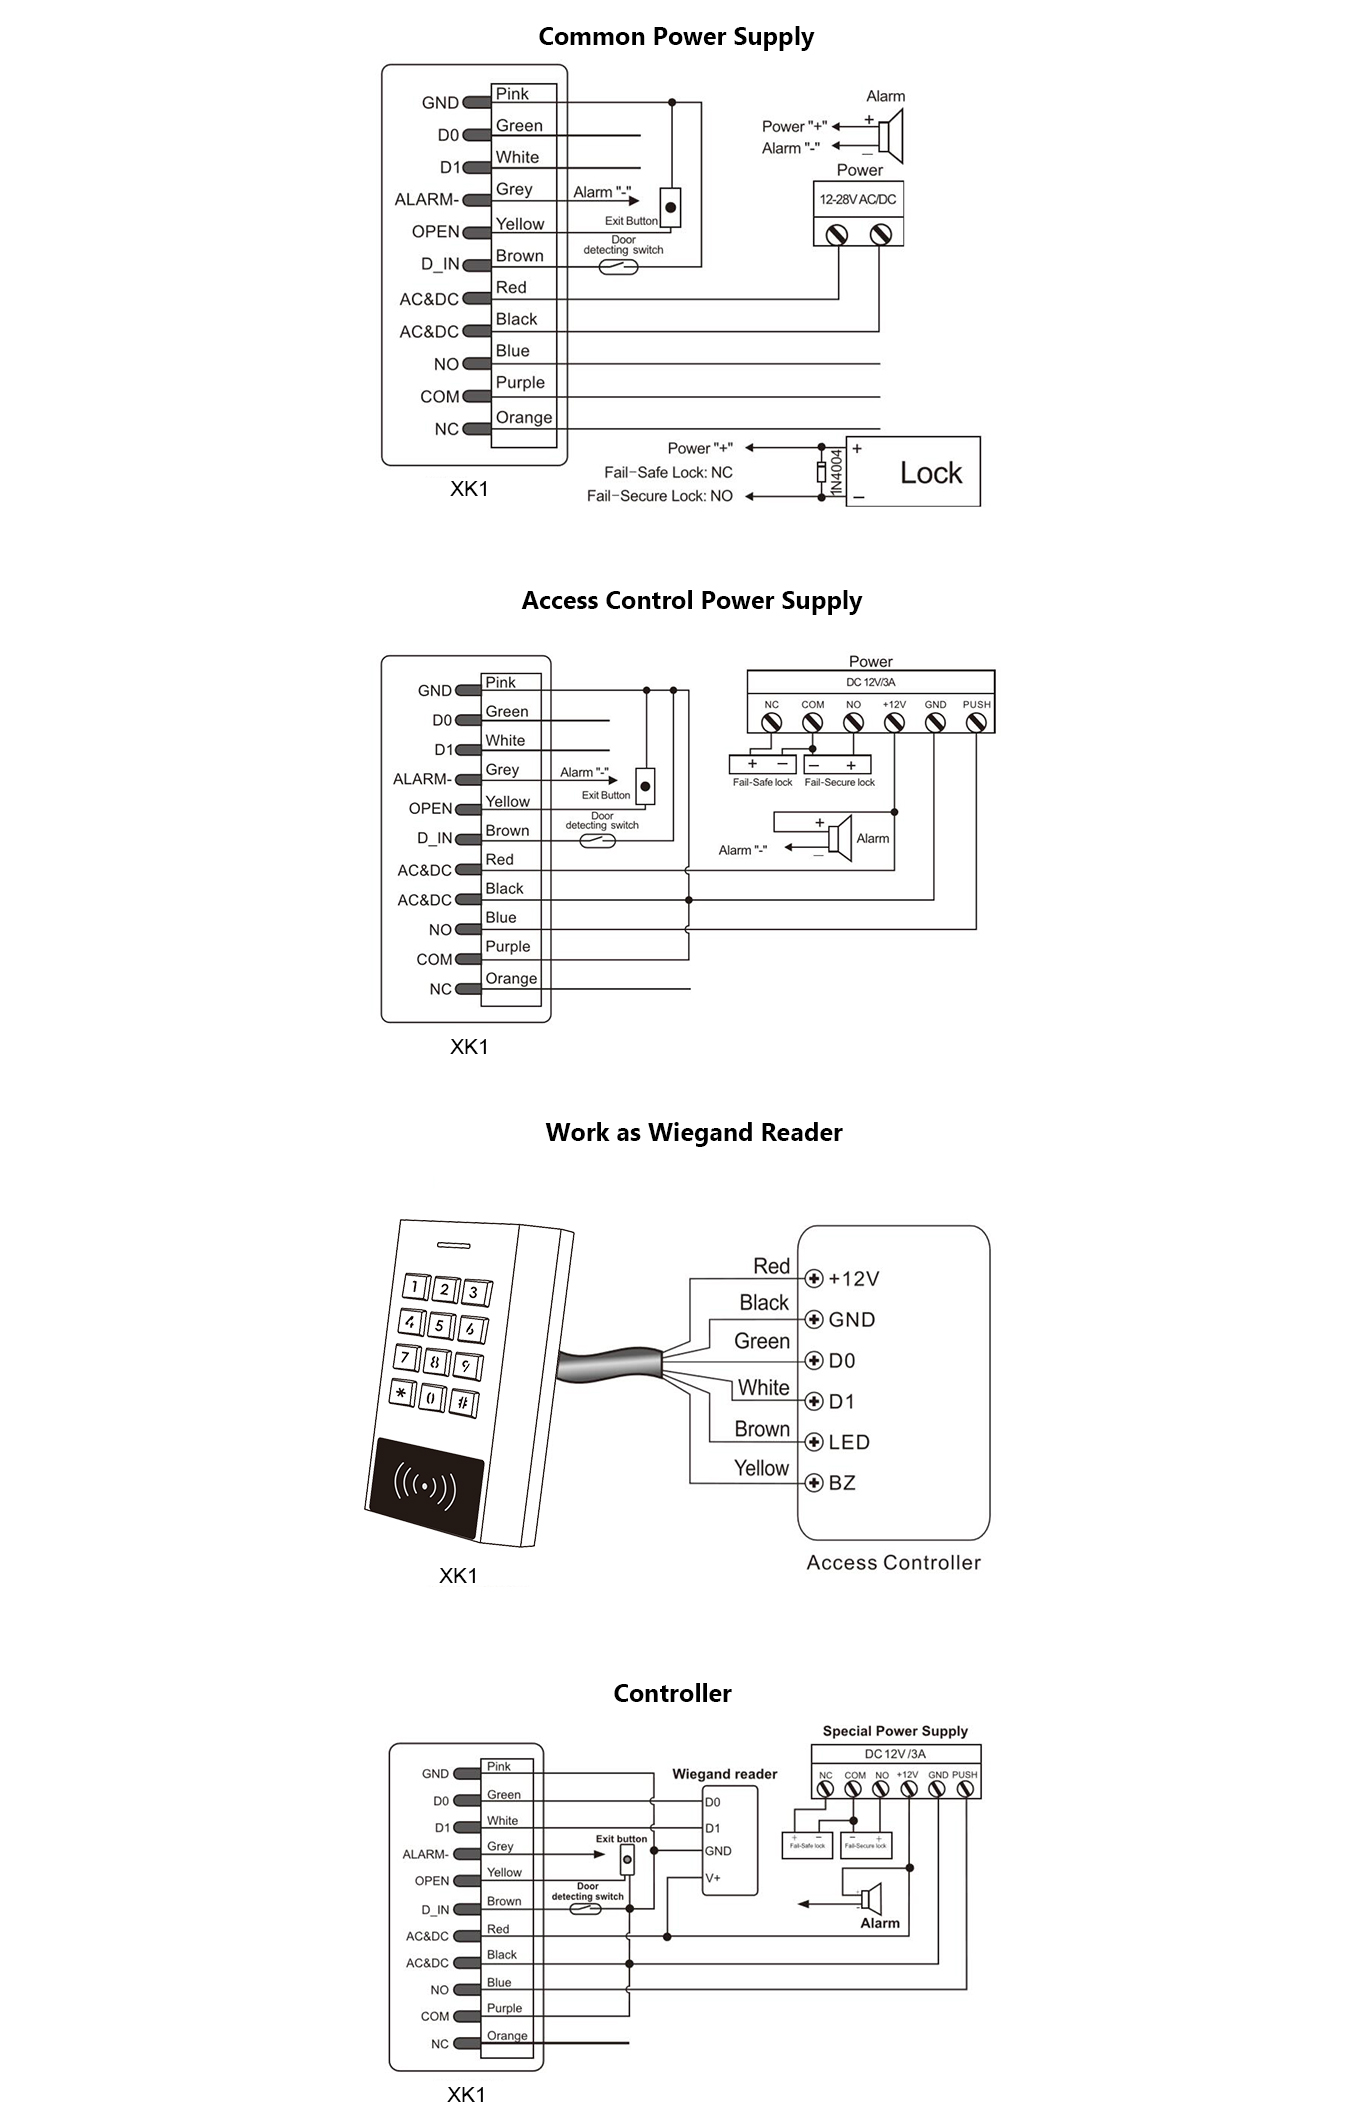 hight resolution of xk1 em user manual